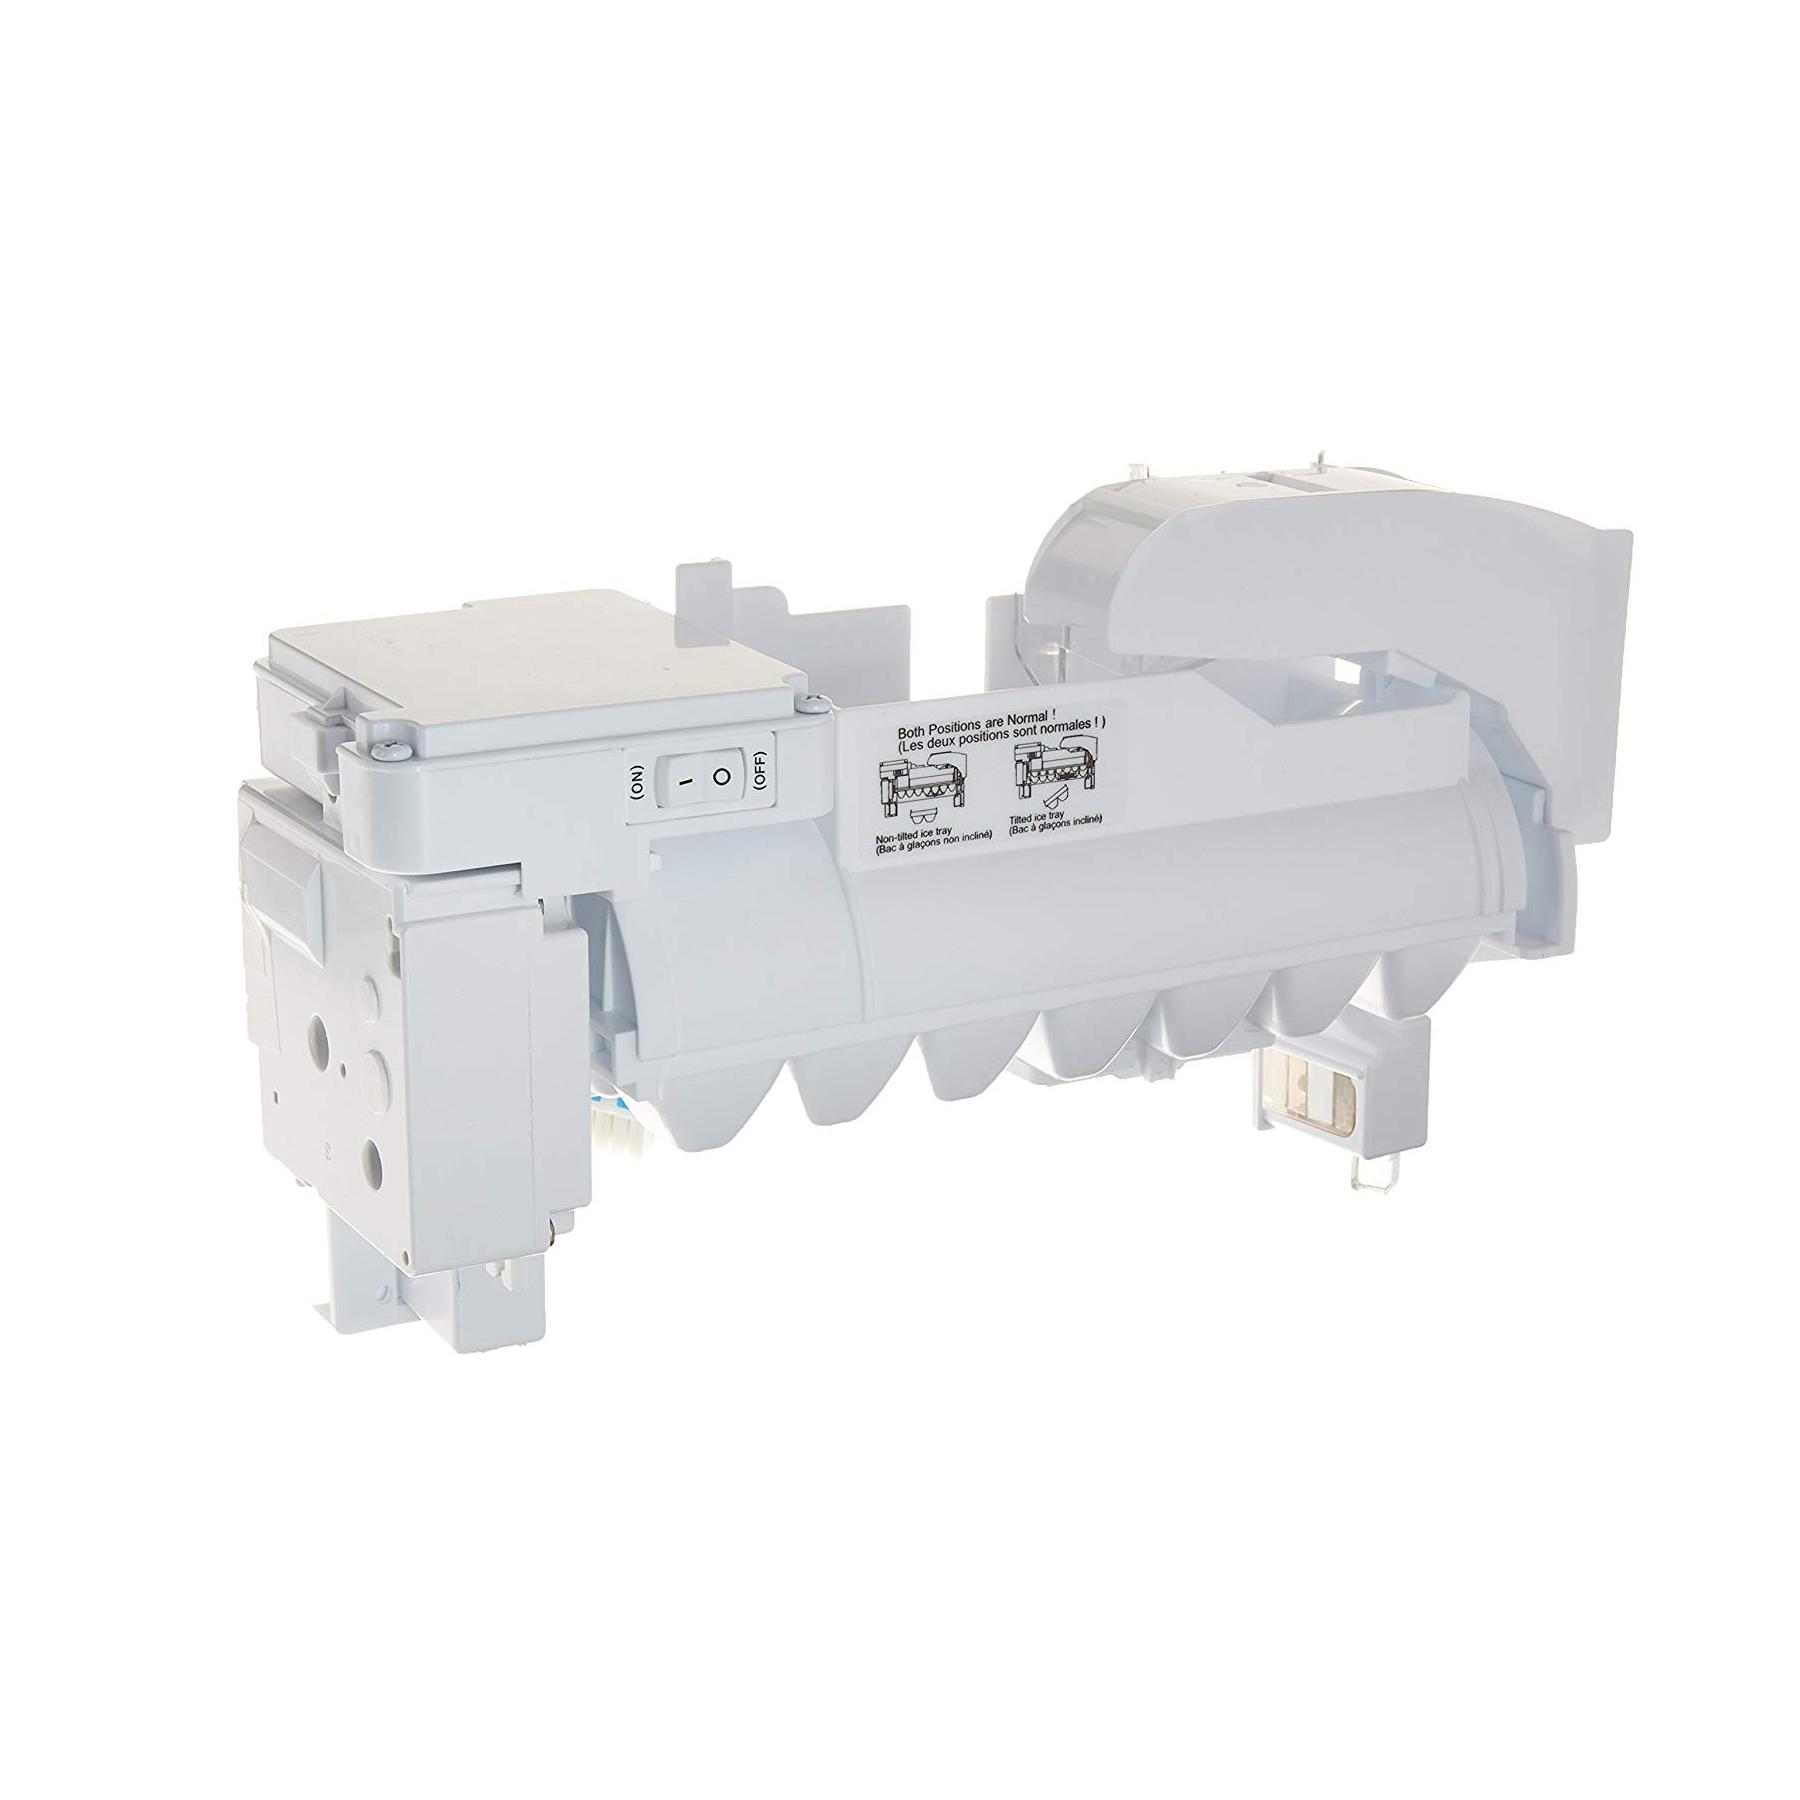 Lg Lmxs30776s Ice Maker Kit